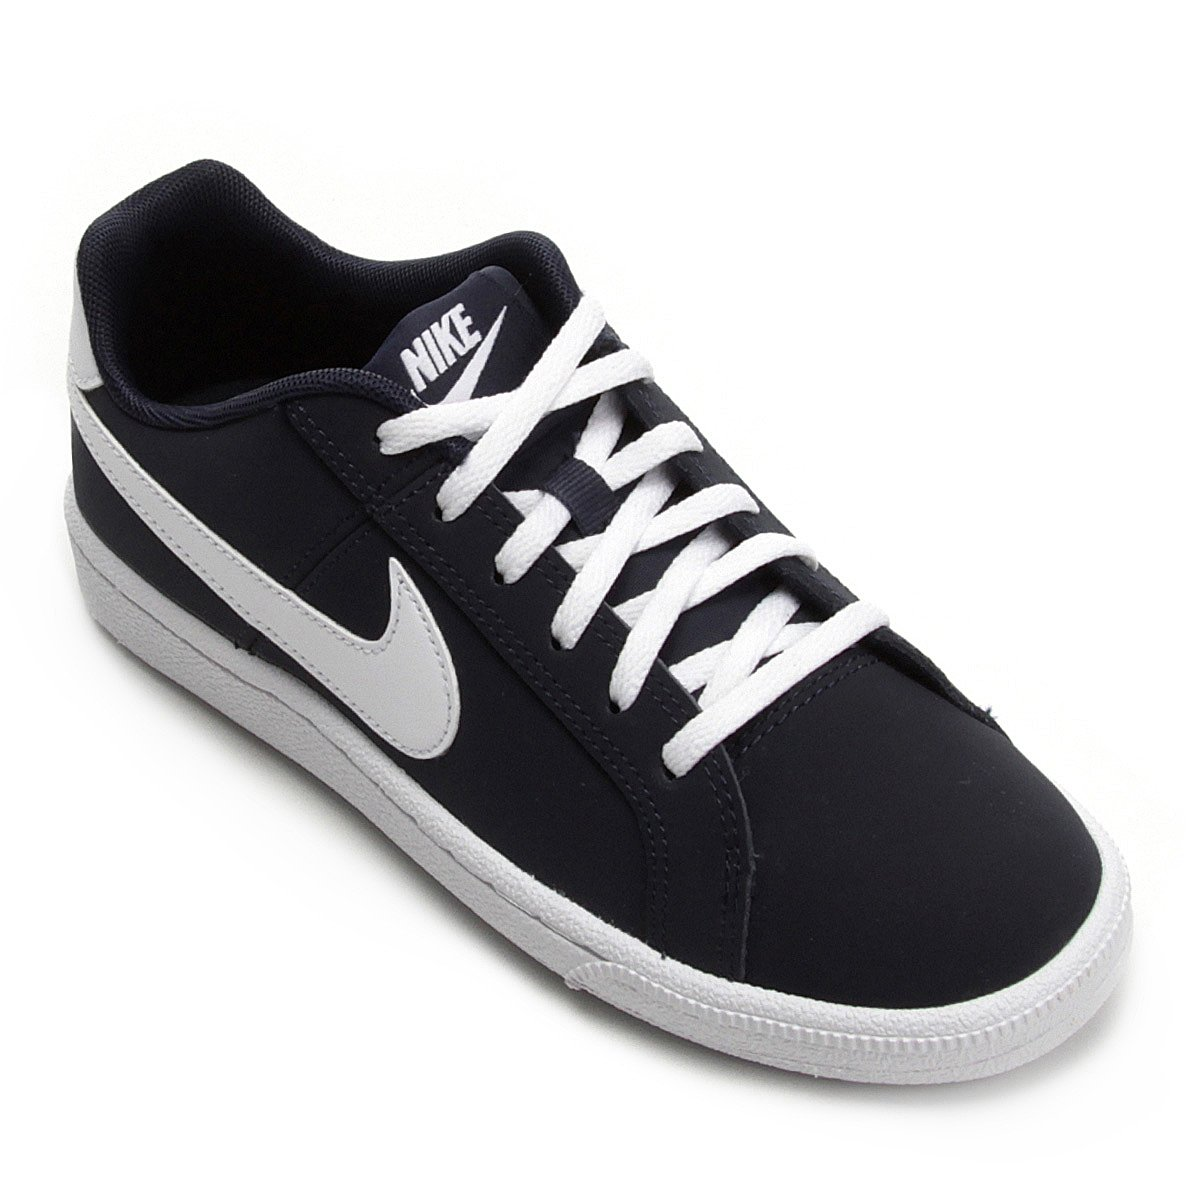 611a91cb747d8 Tênis Infantil Couro Nike Court Royale Masculino - Preto e Gelo ...